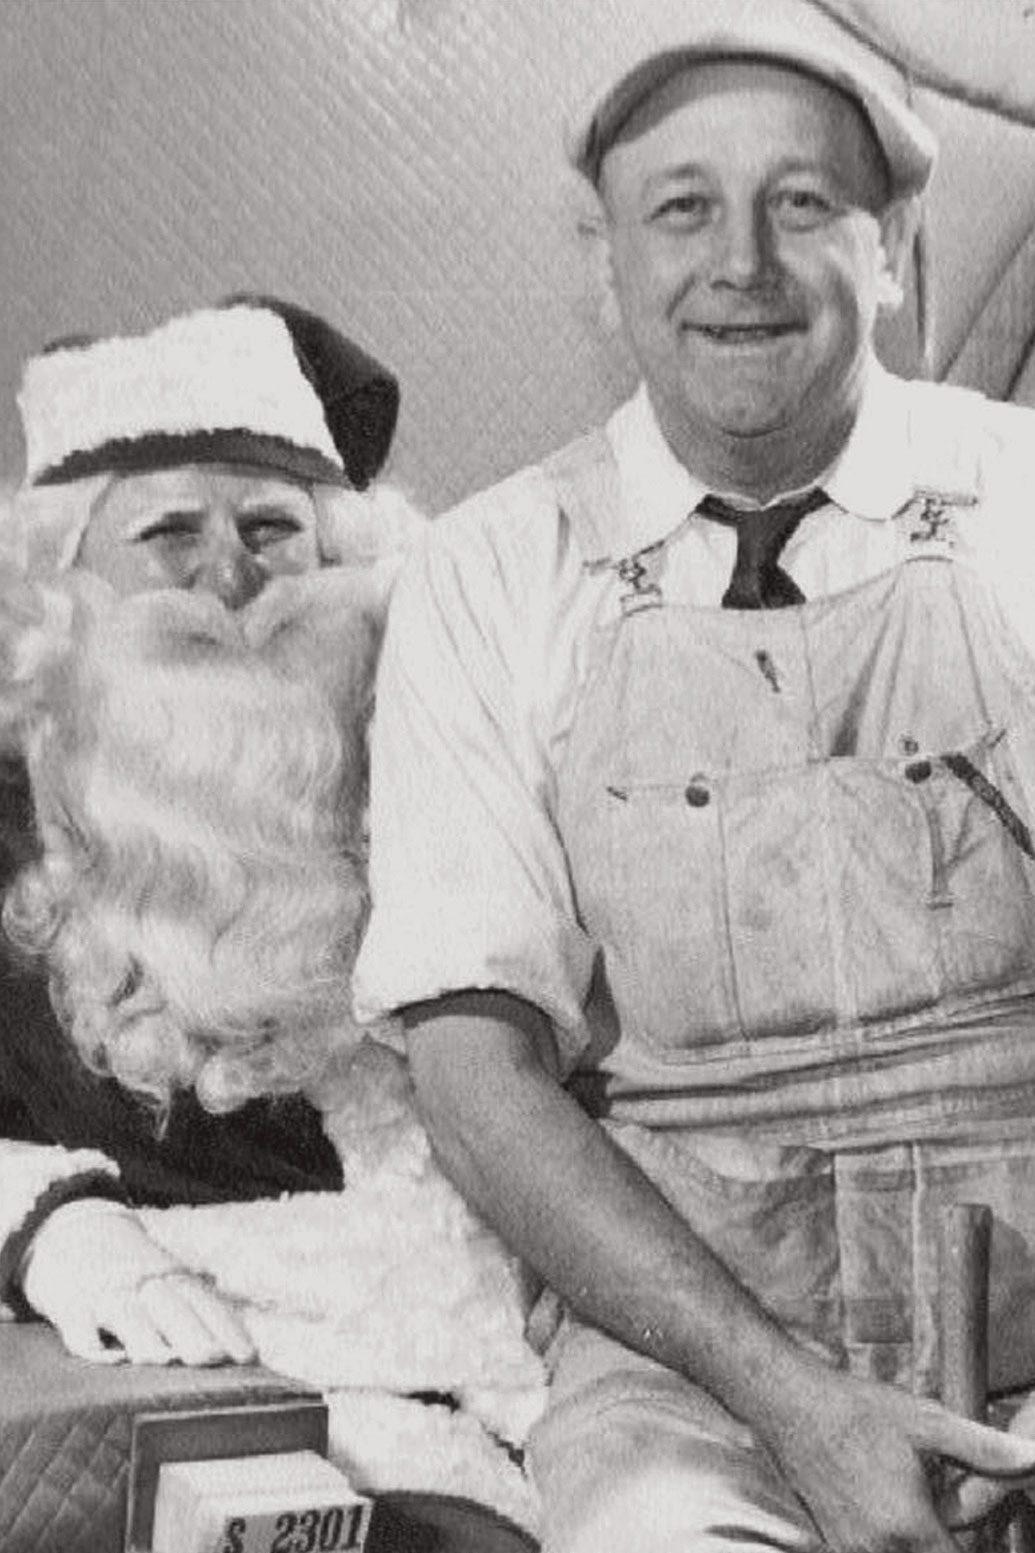 vintage christmas photo